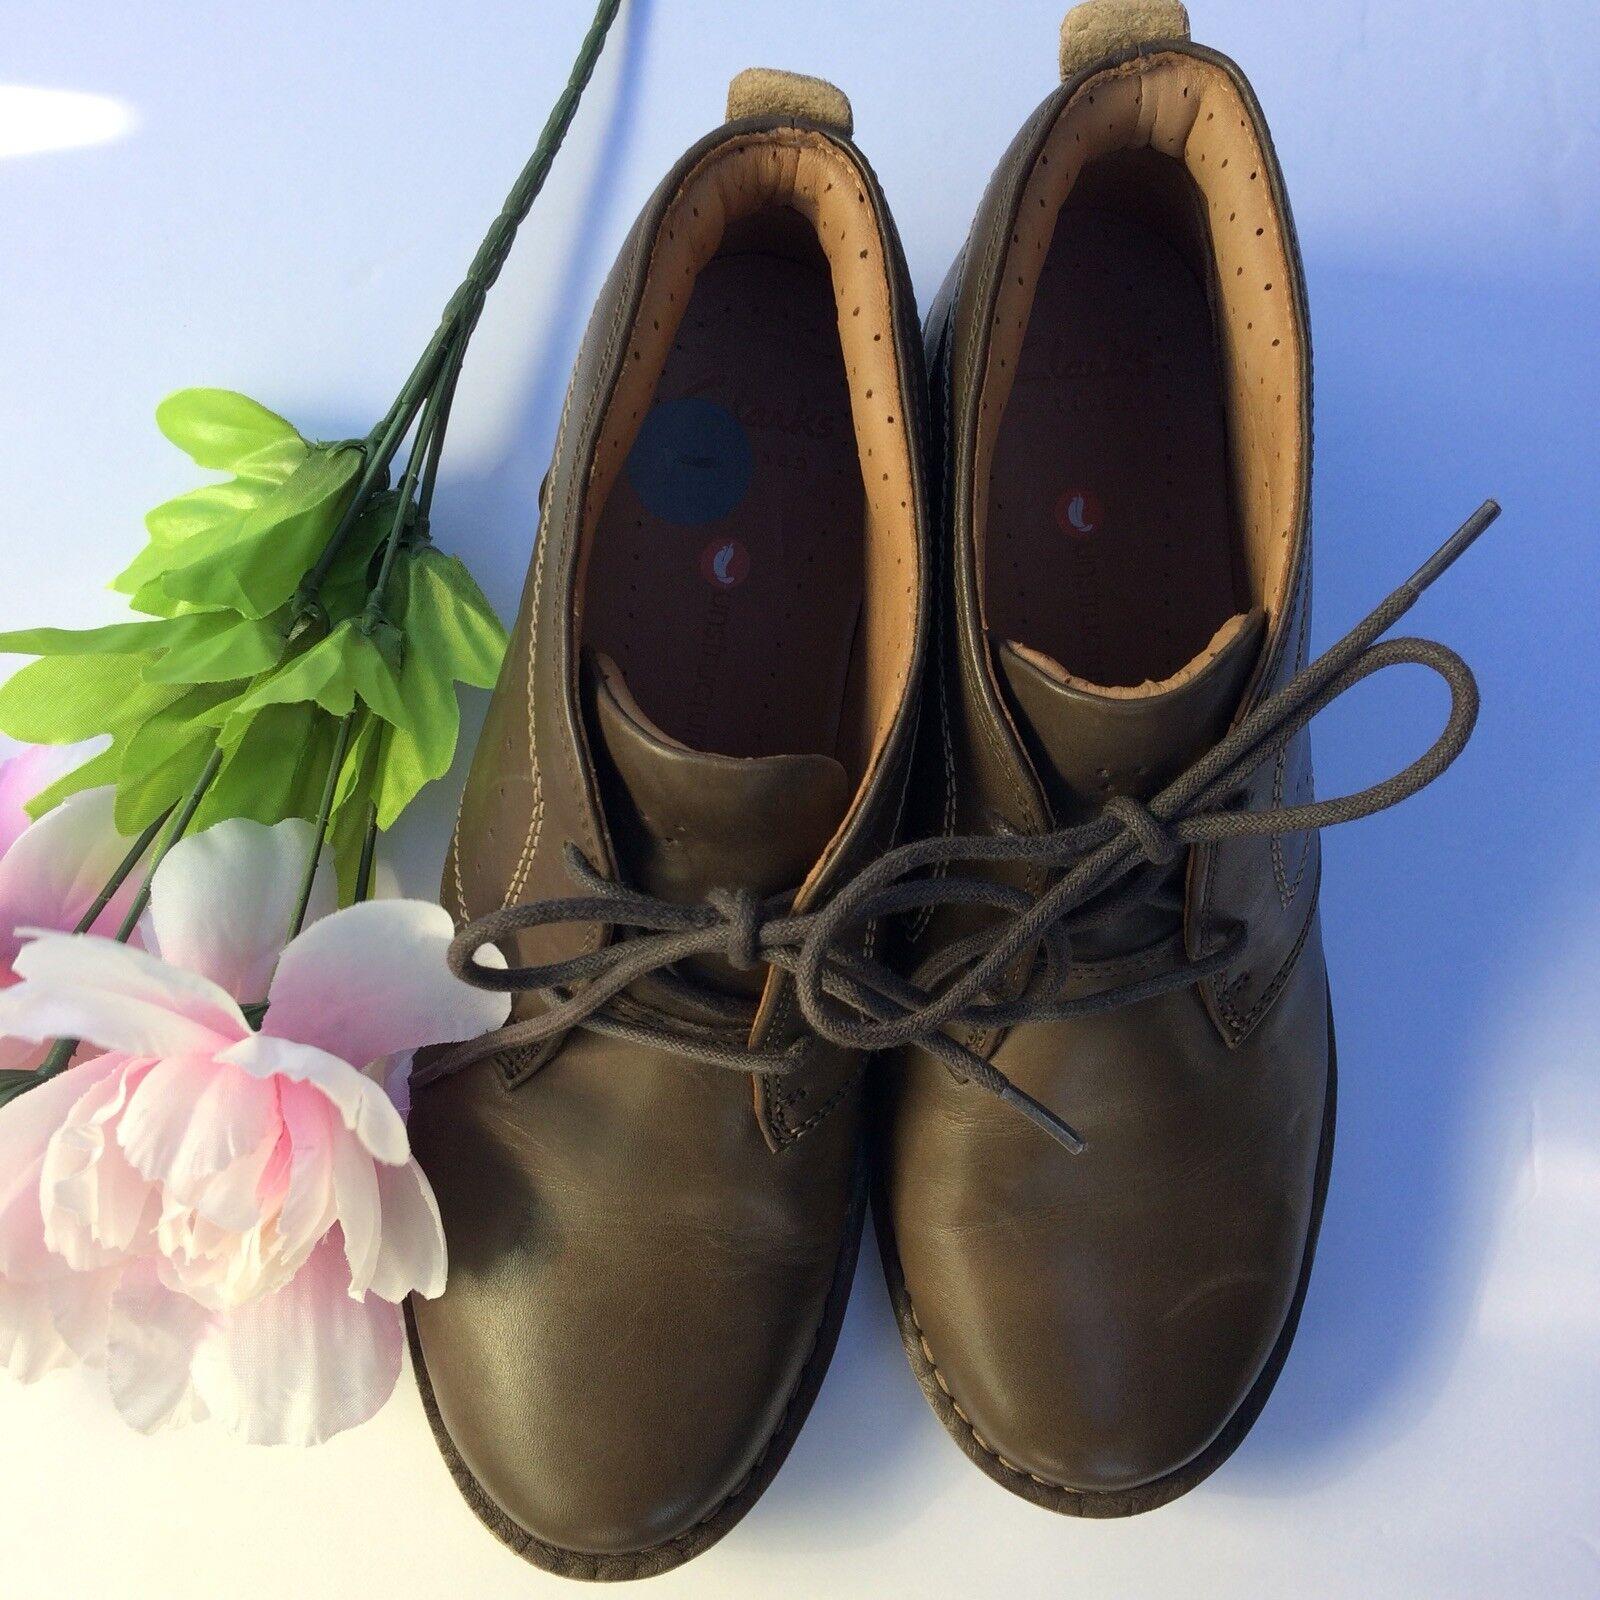 NWOB Clarks Unstructured Un Astin Boot Booties Women's Size 7 Brown